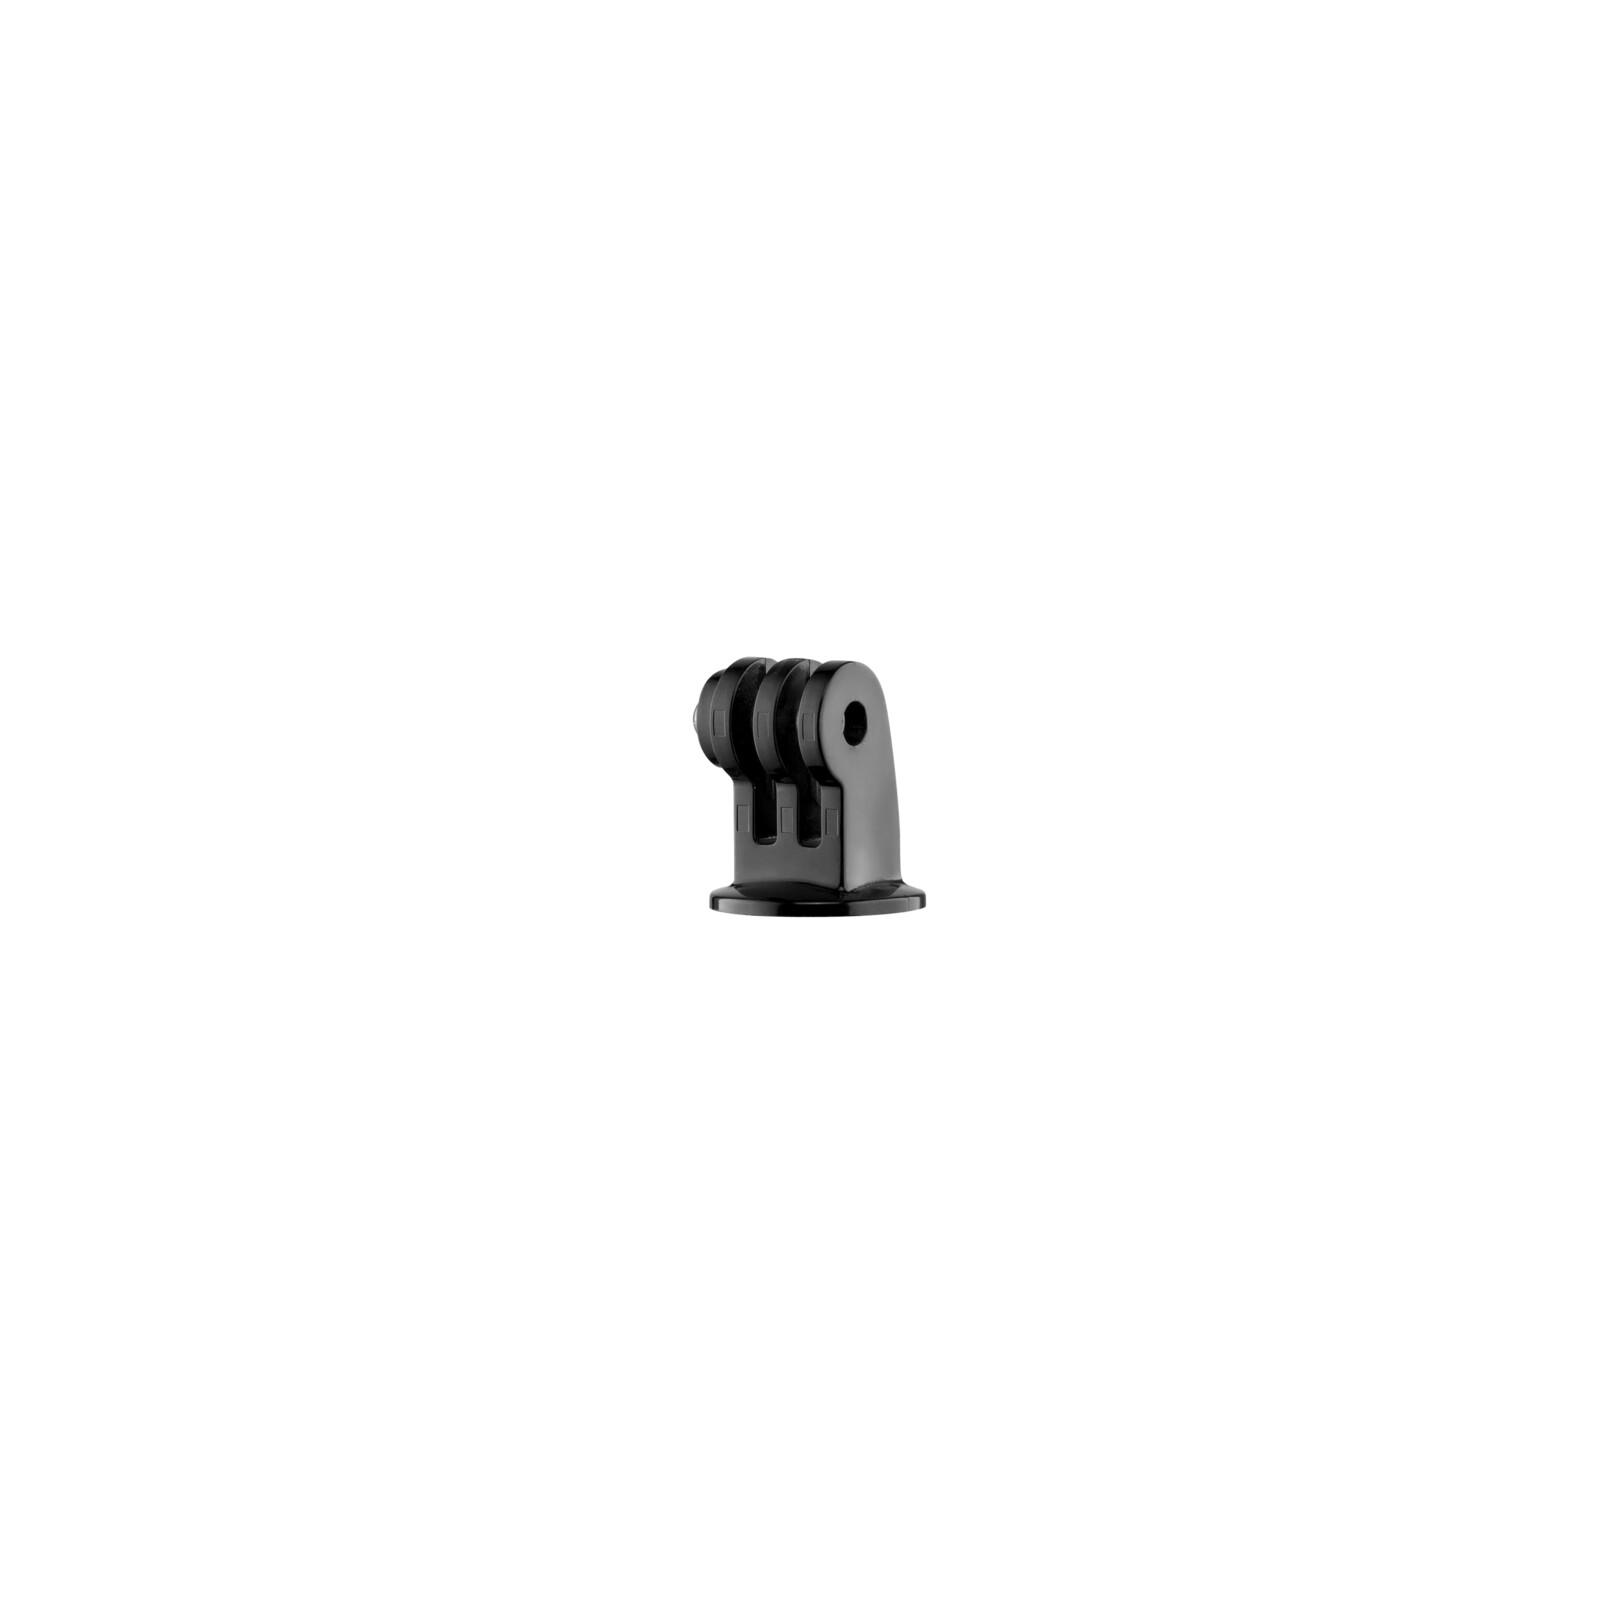 Manfrotto EXADPT GoPro Adapter